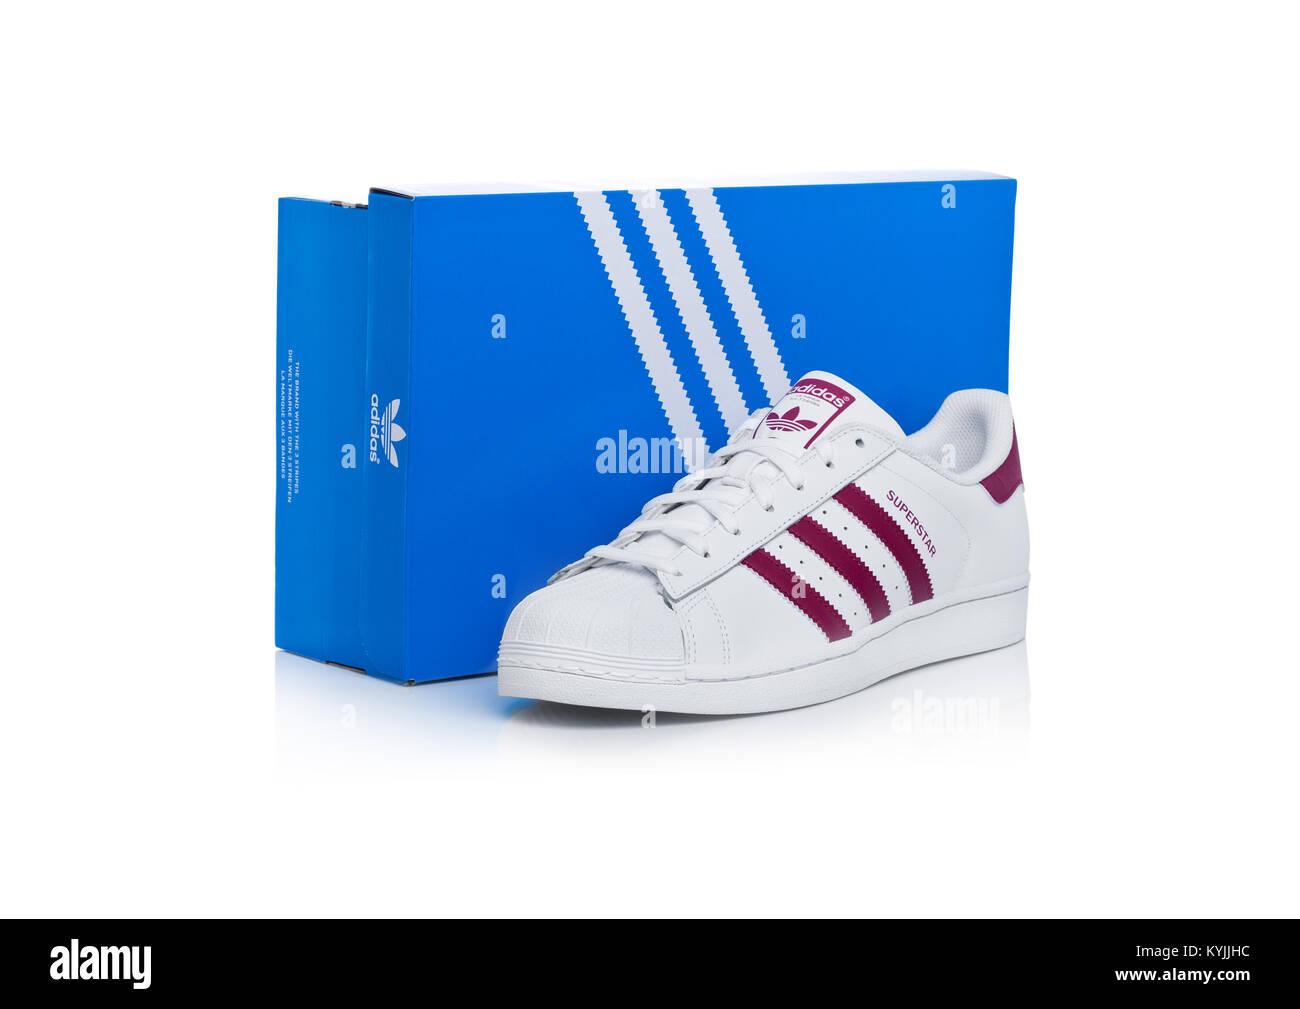 41a3328caa Originali Adidas Immagini & Originali Adidas Fotos Stock - Alamy